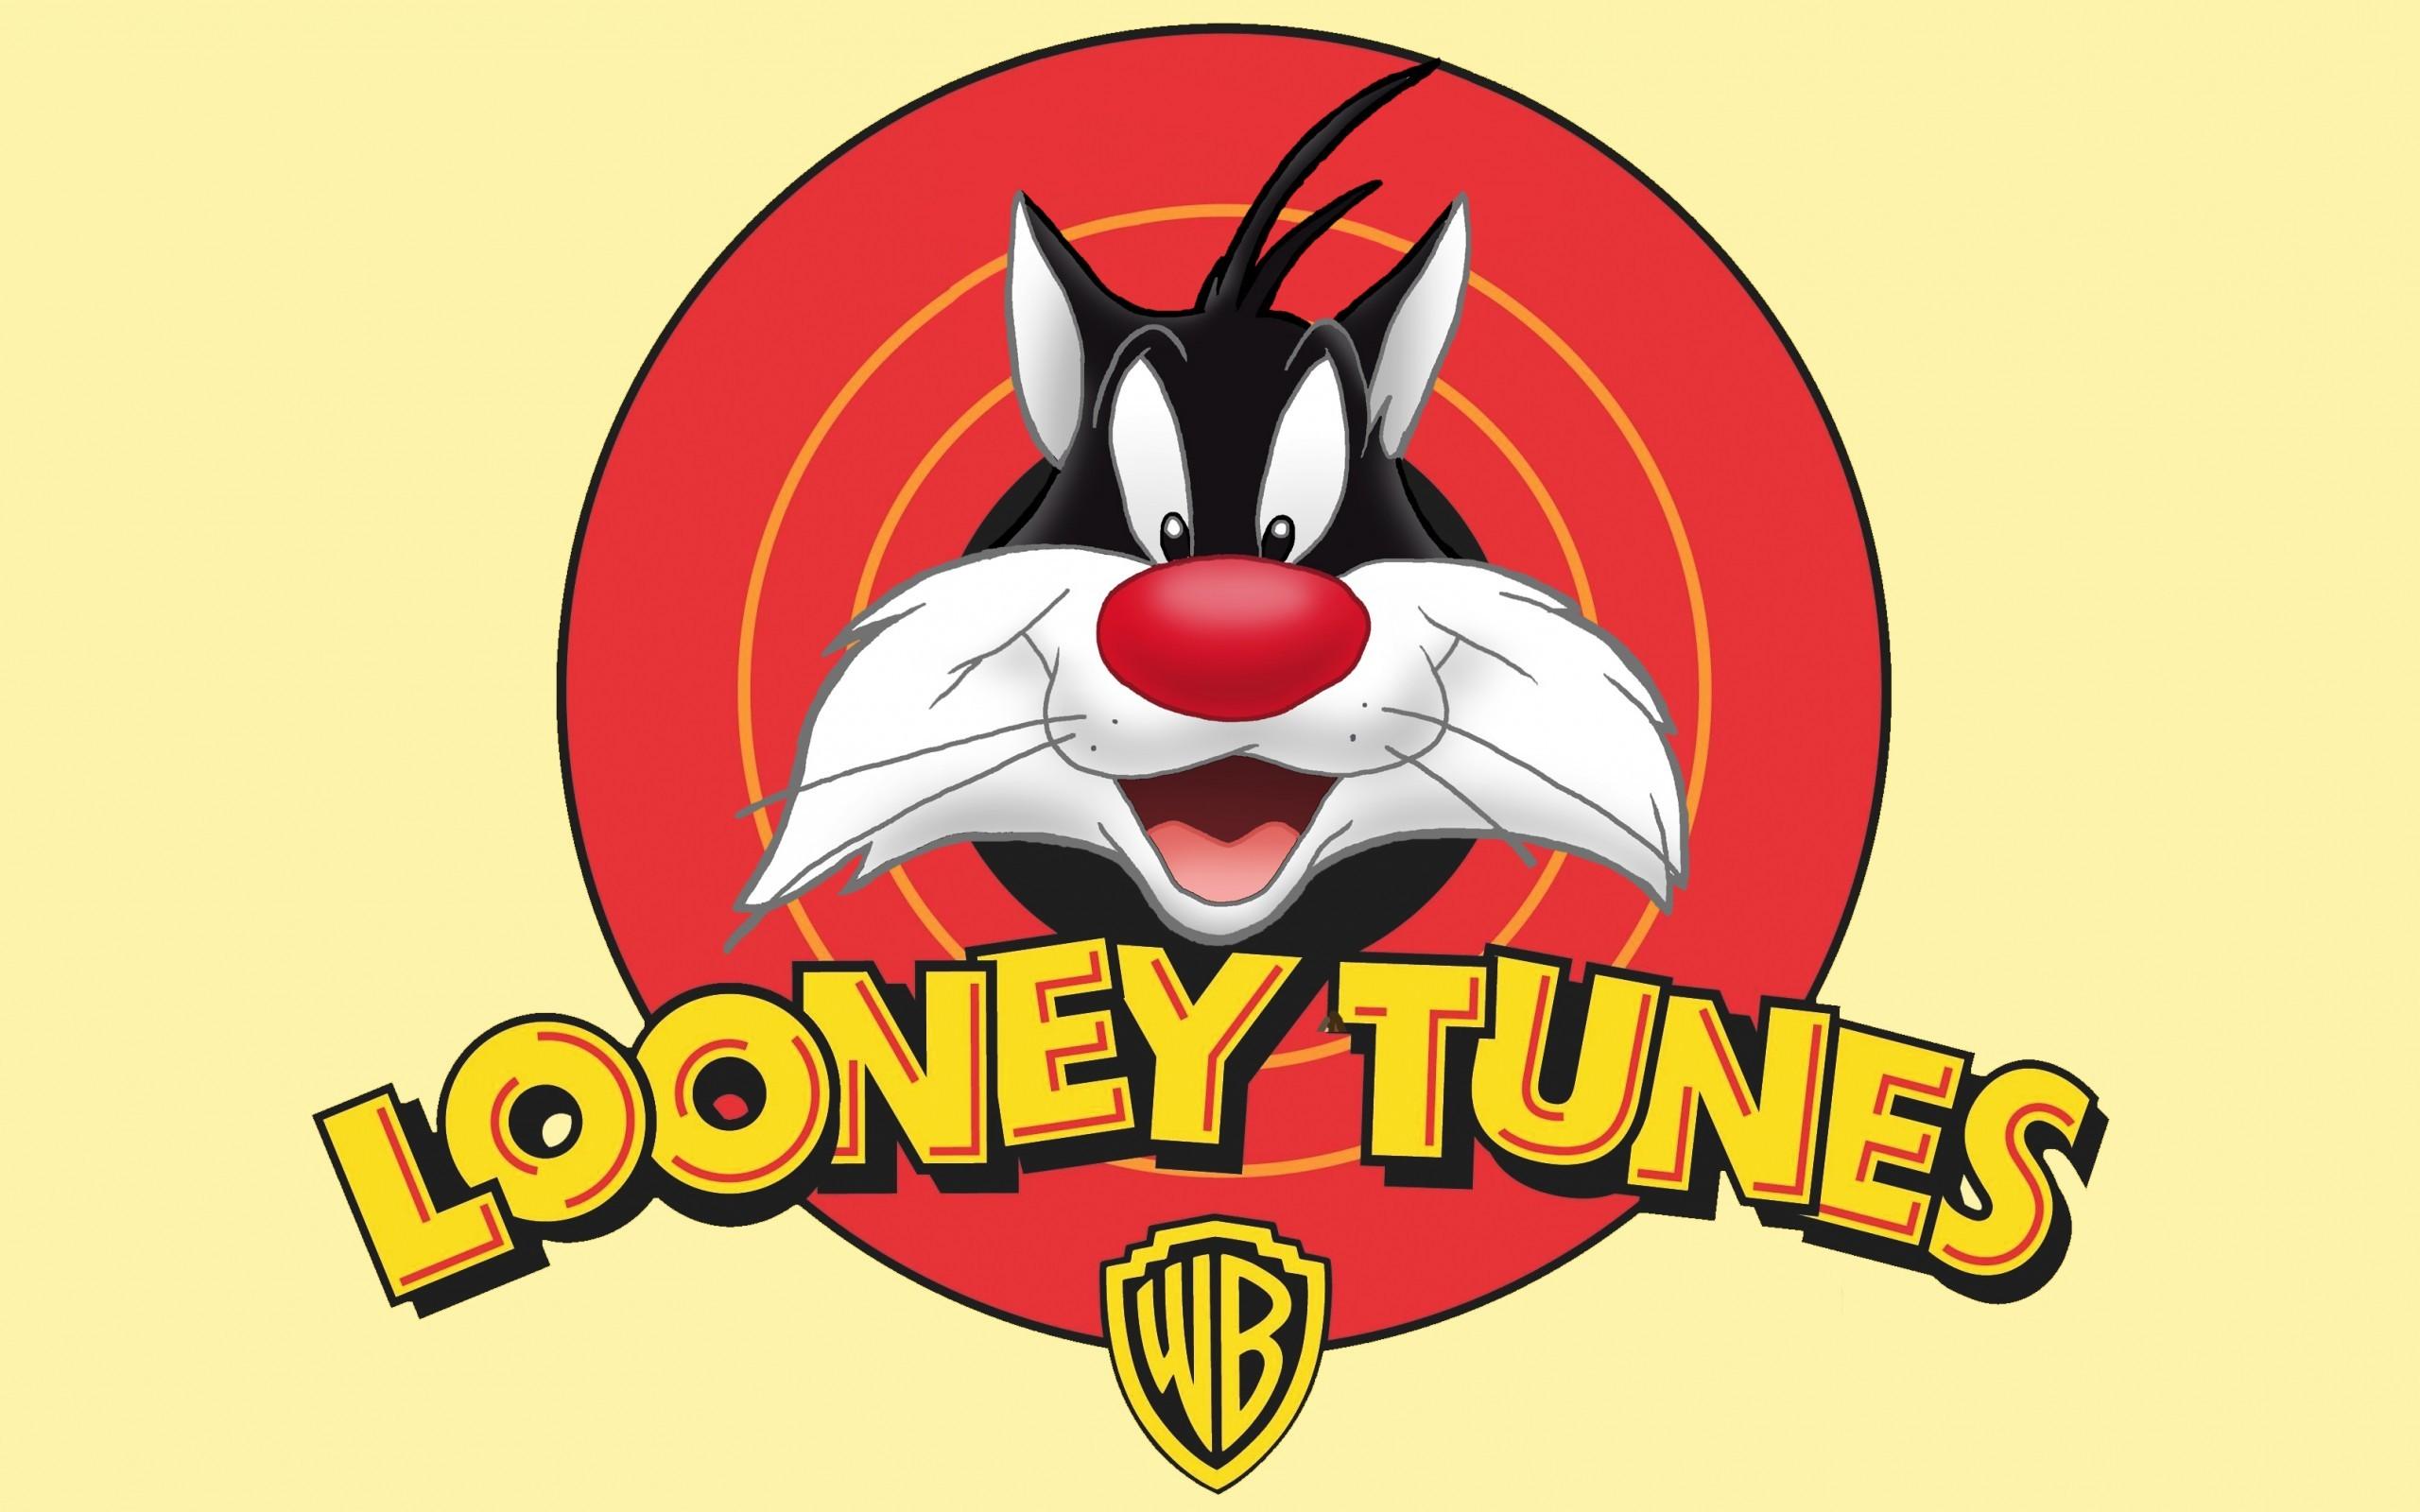 Supreme Wallpaper Girl Cartoon Baby Looney Tunes Wallpaper 52 Images